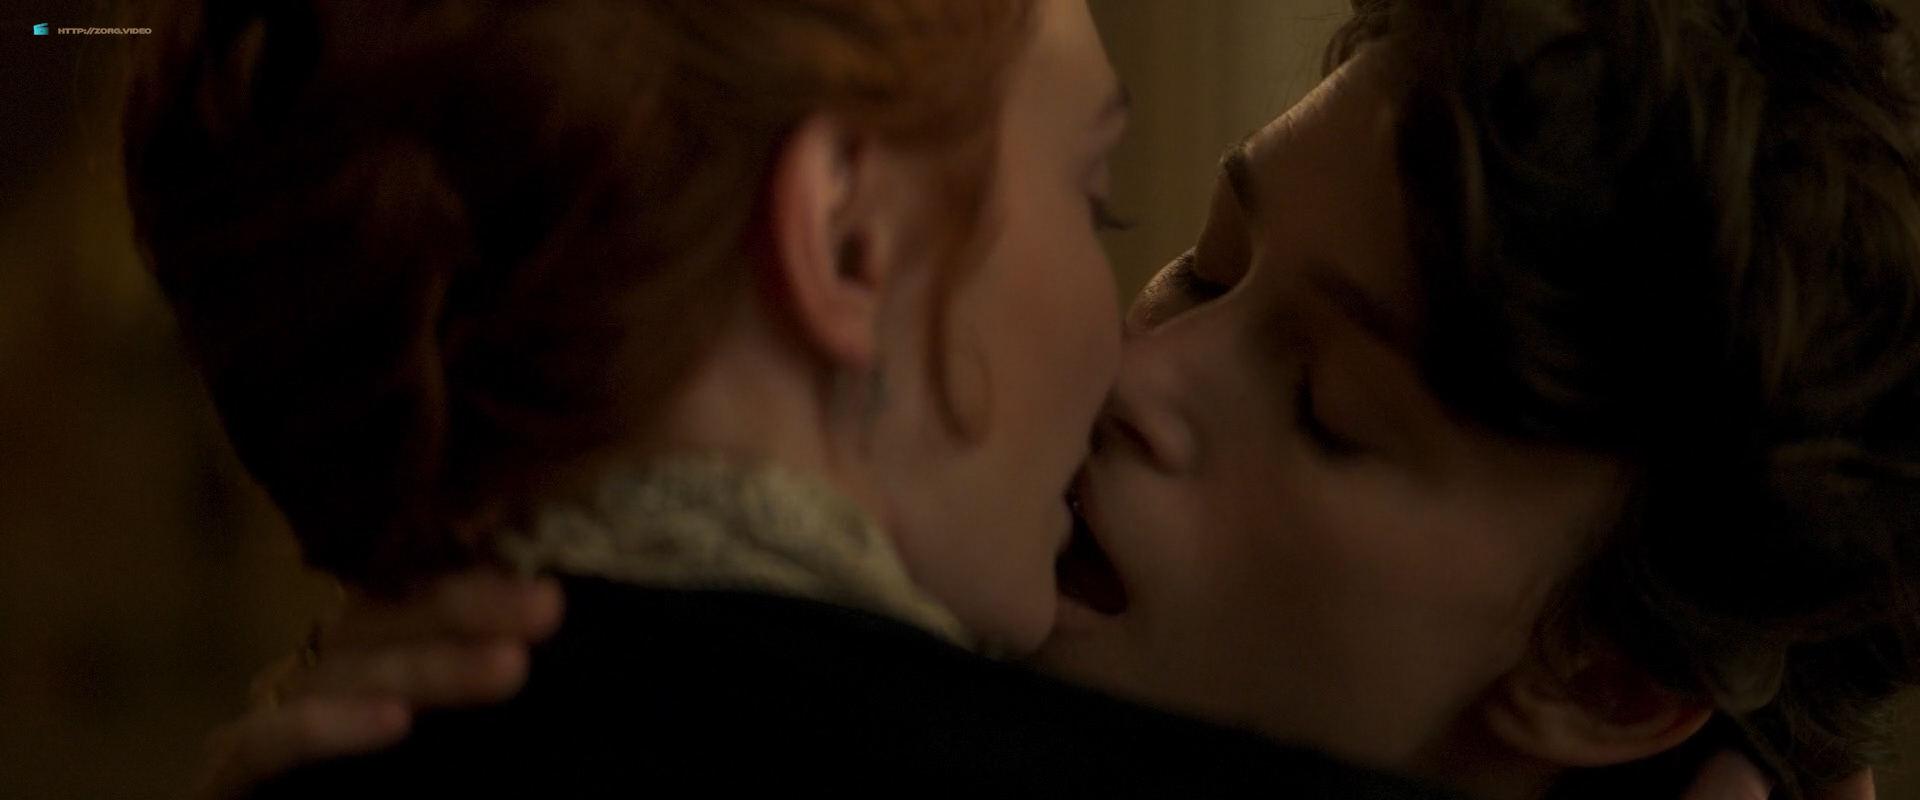 Keira knightley naked lesbian something